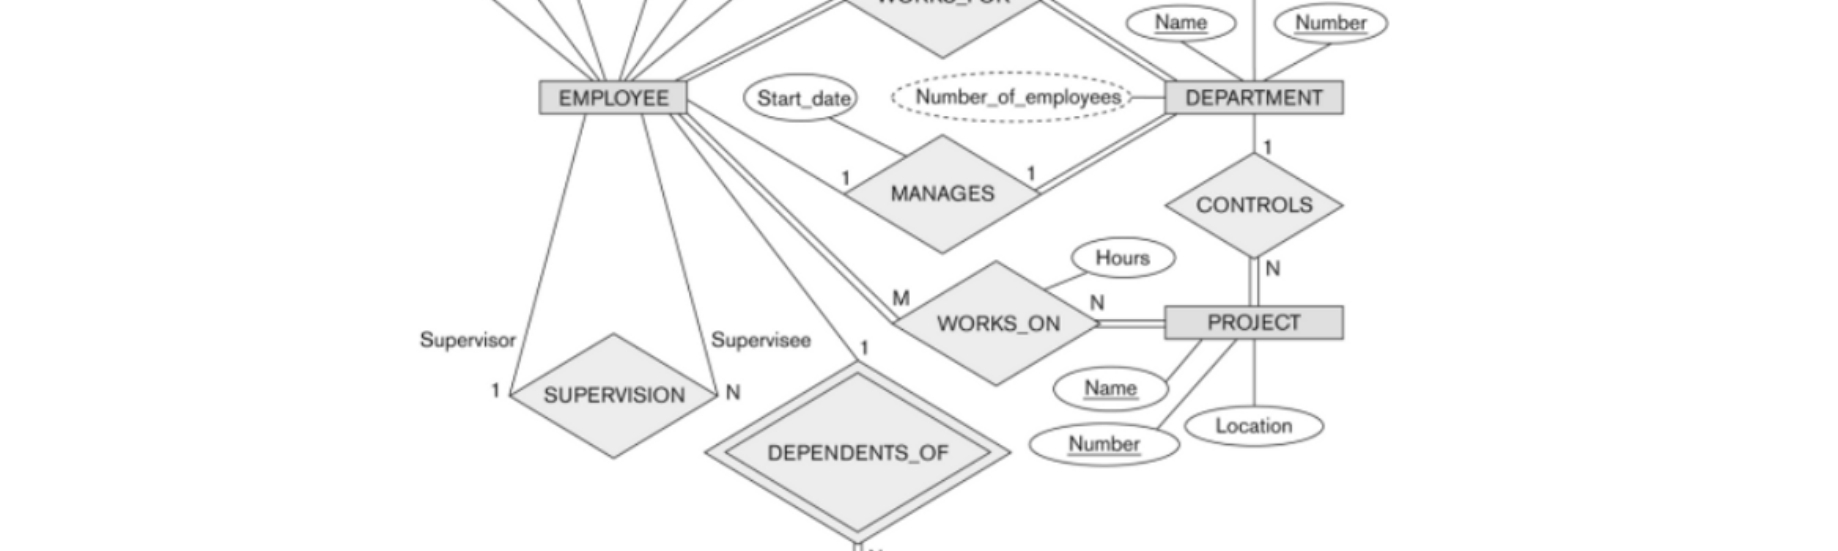 Database — Modeling : Entity Relationship Diagram (Erd) (Part 5) throughout Er Diagram Unique Attribute